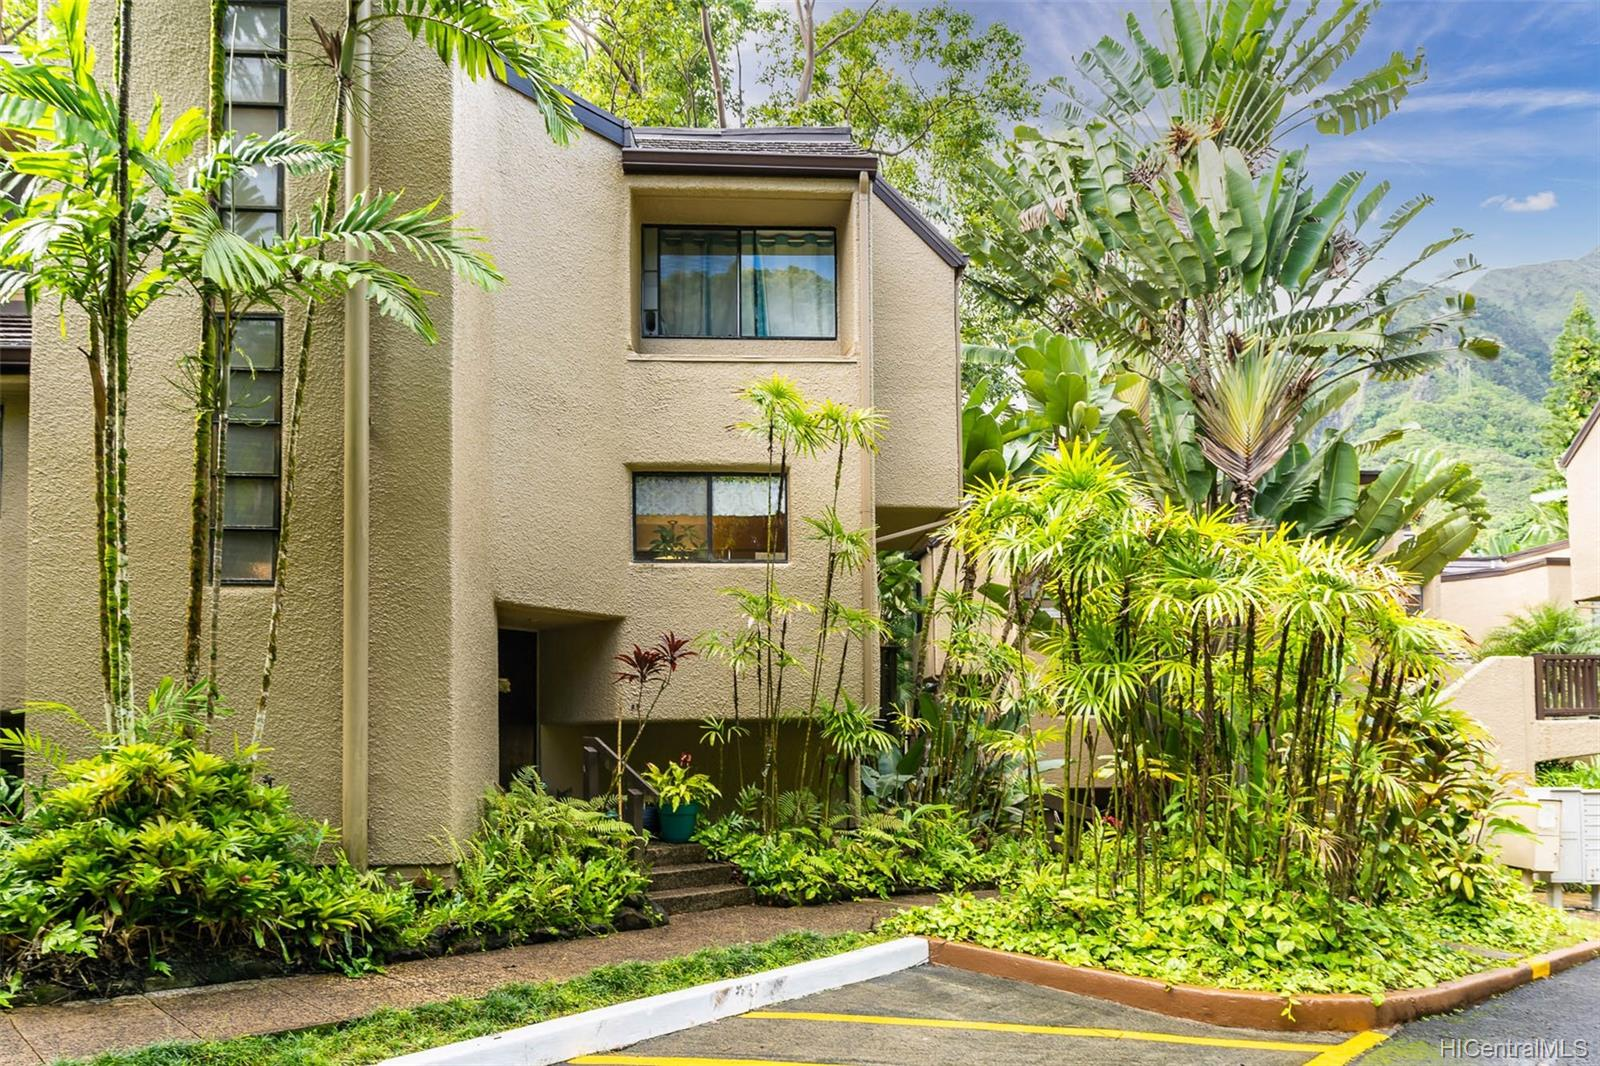 46-369 Haiku Road townhouse # F9, Kaneohe, Hawaii - photo 23 of 23